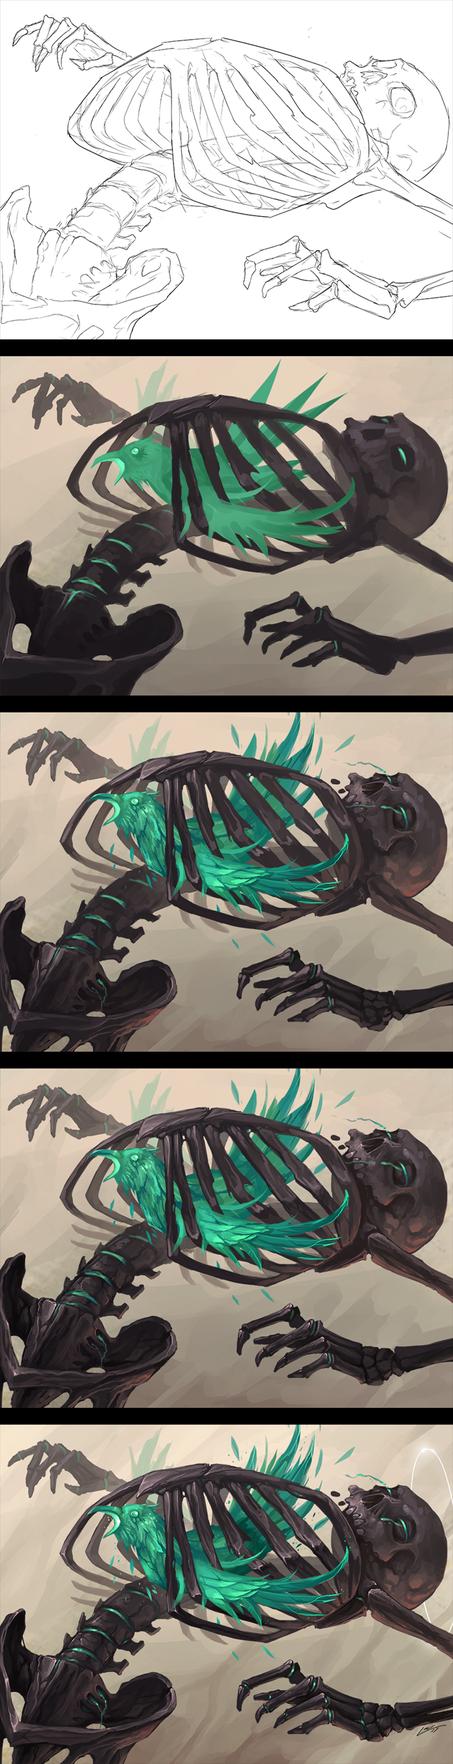 Bird Cage - Progress by Lanasy